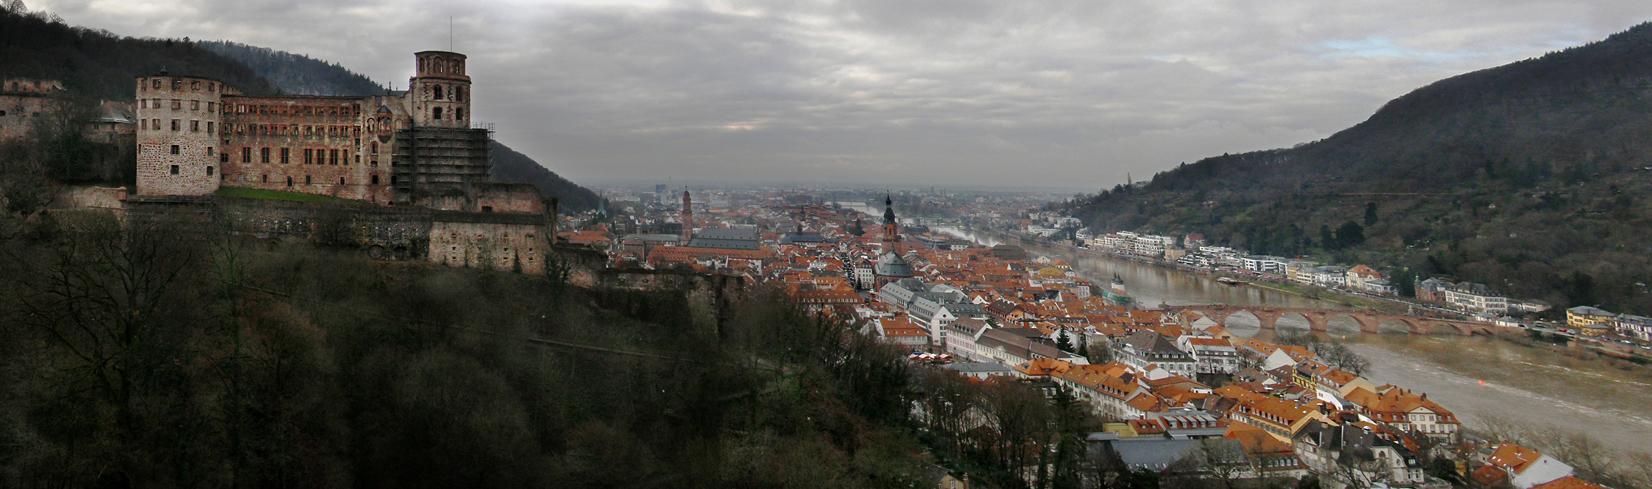 Heidelberg. P